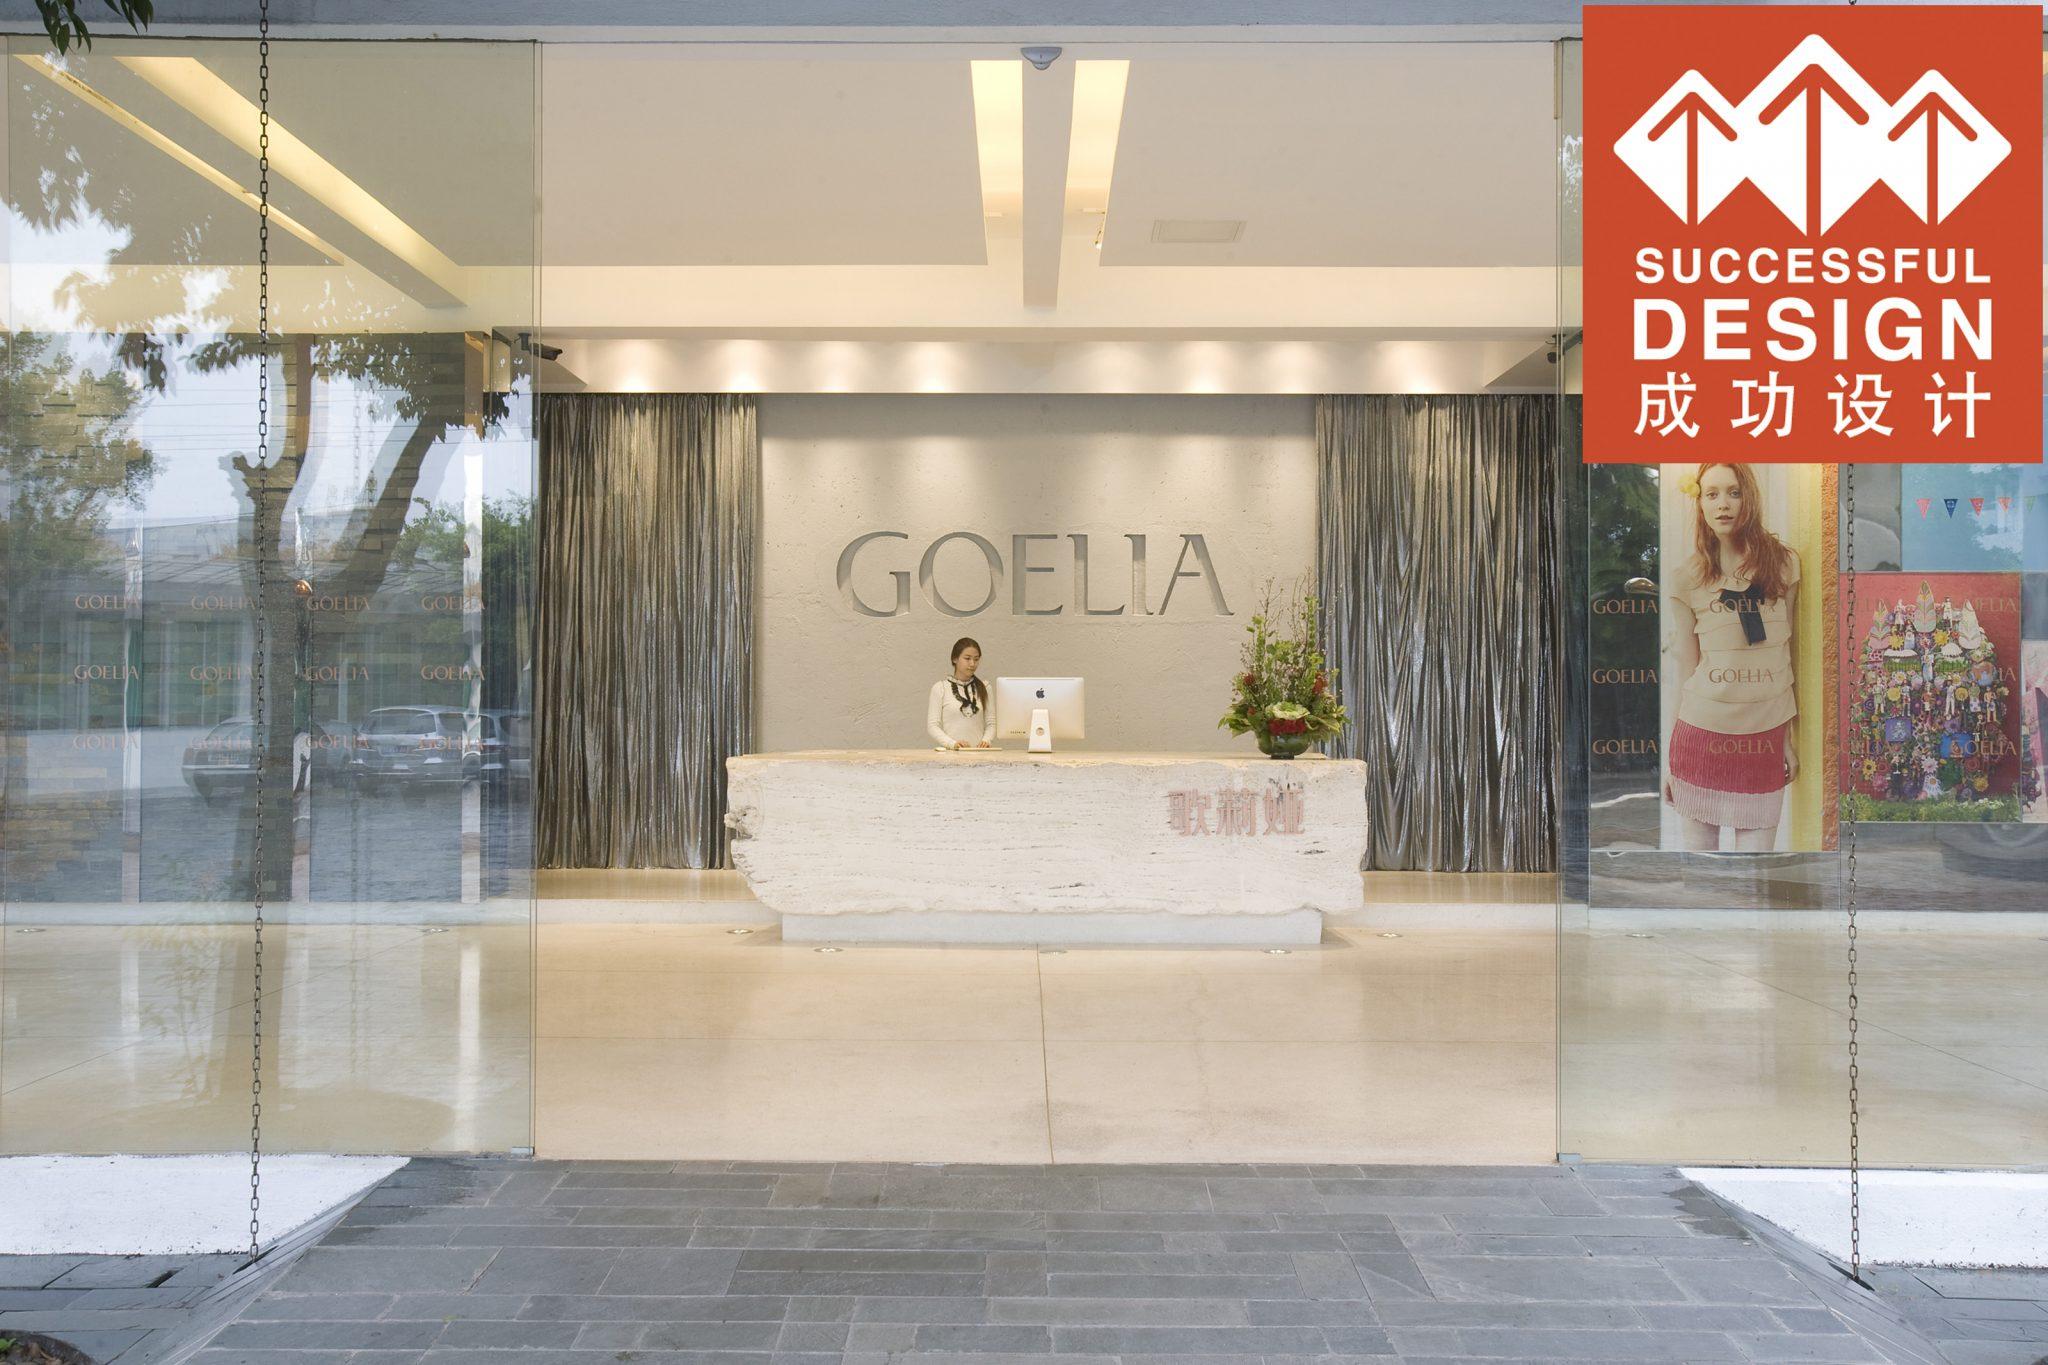 Goelia Headquarter – Successful Design Award 2013